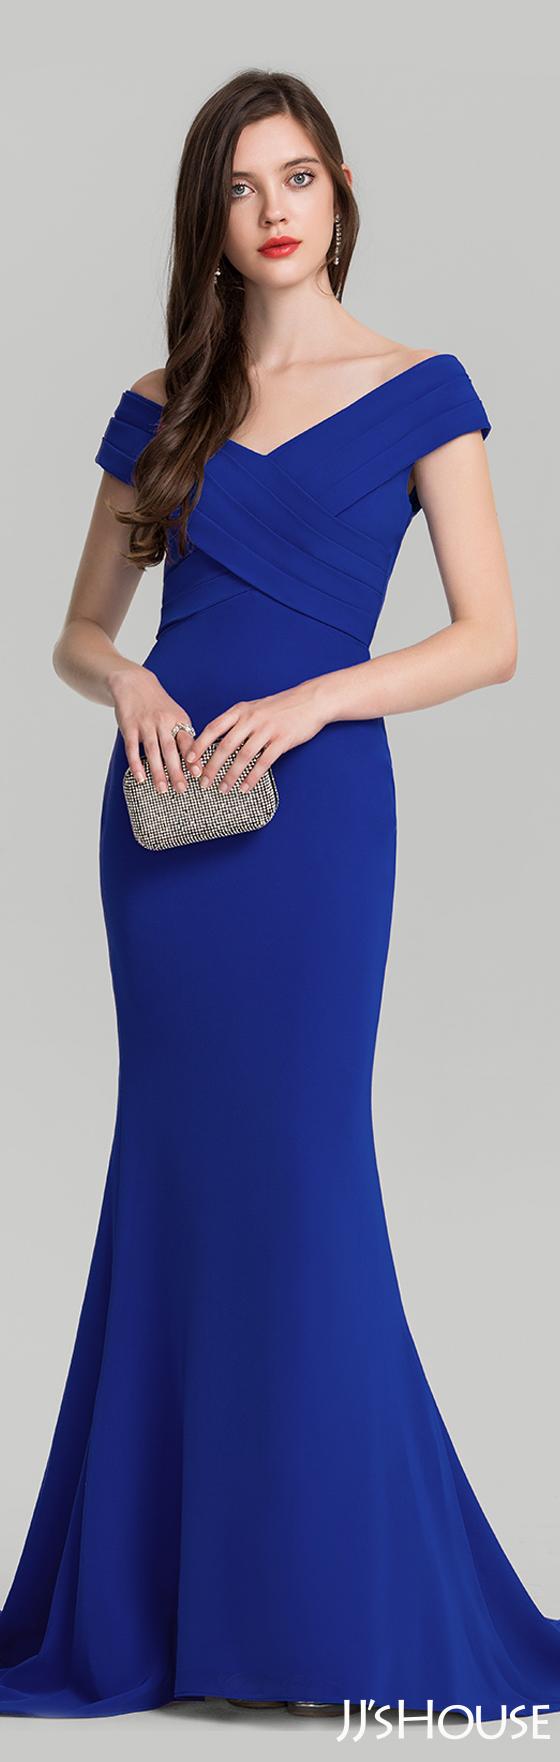 Trumpet/Mermaid Off-the-Shoulder Sweep Train Satin Evening Dress ...